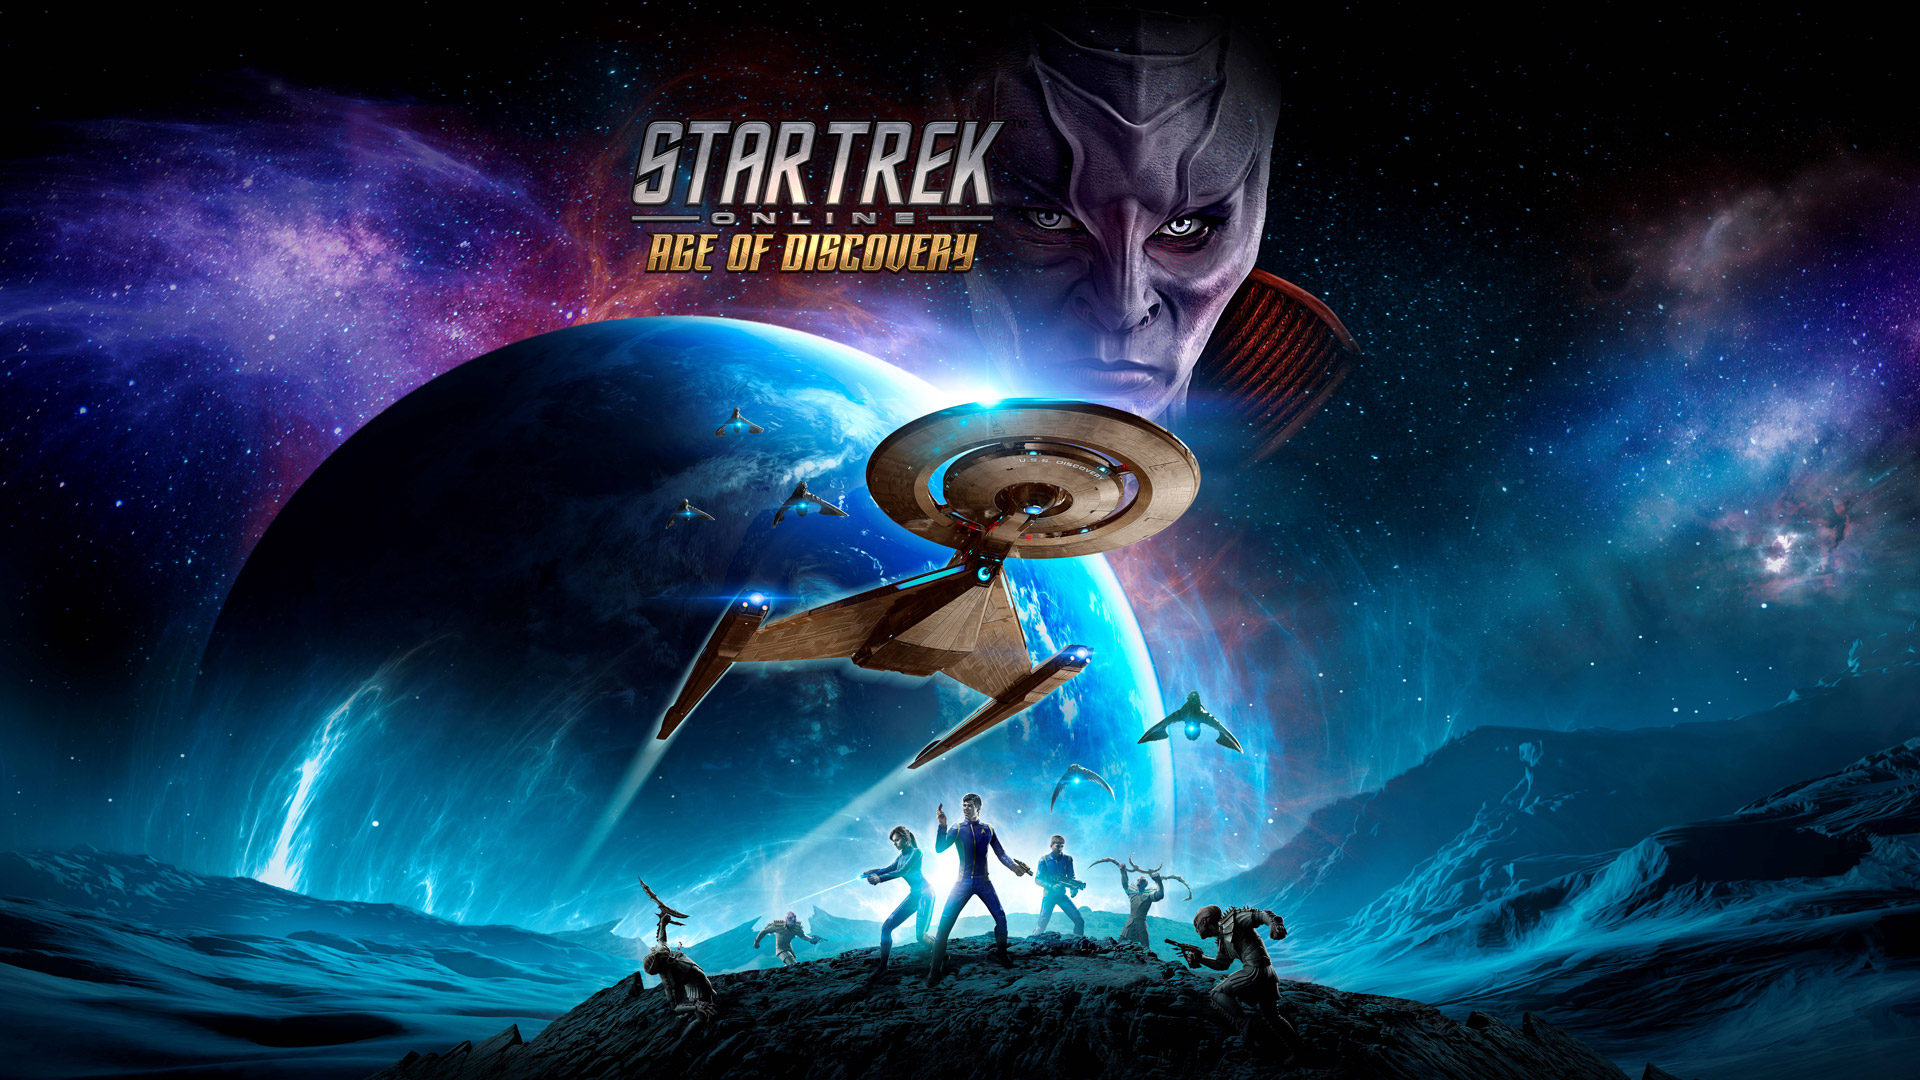 Free Star Trek Online Wallpaper In Star Trek Online Wallpaper 4k 1920x1080 Download Hd Wallpaper Wallpapertip